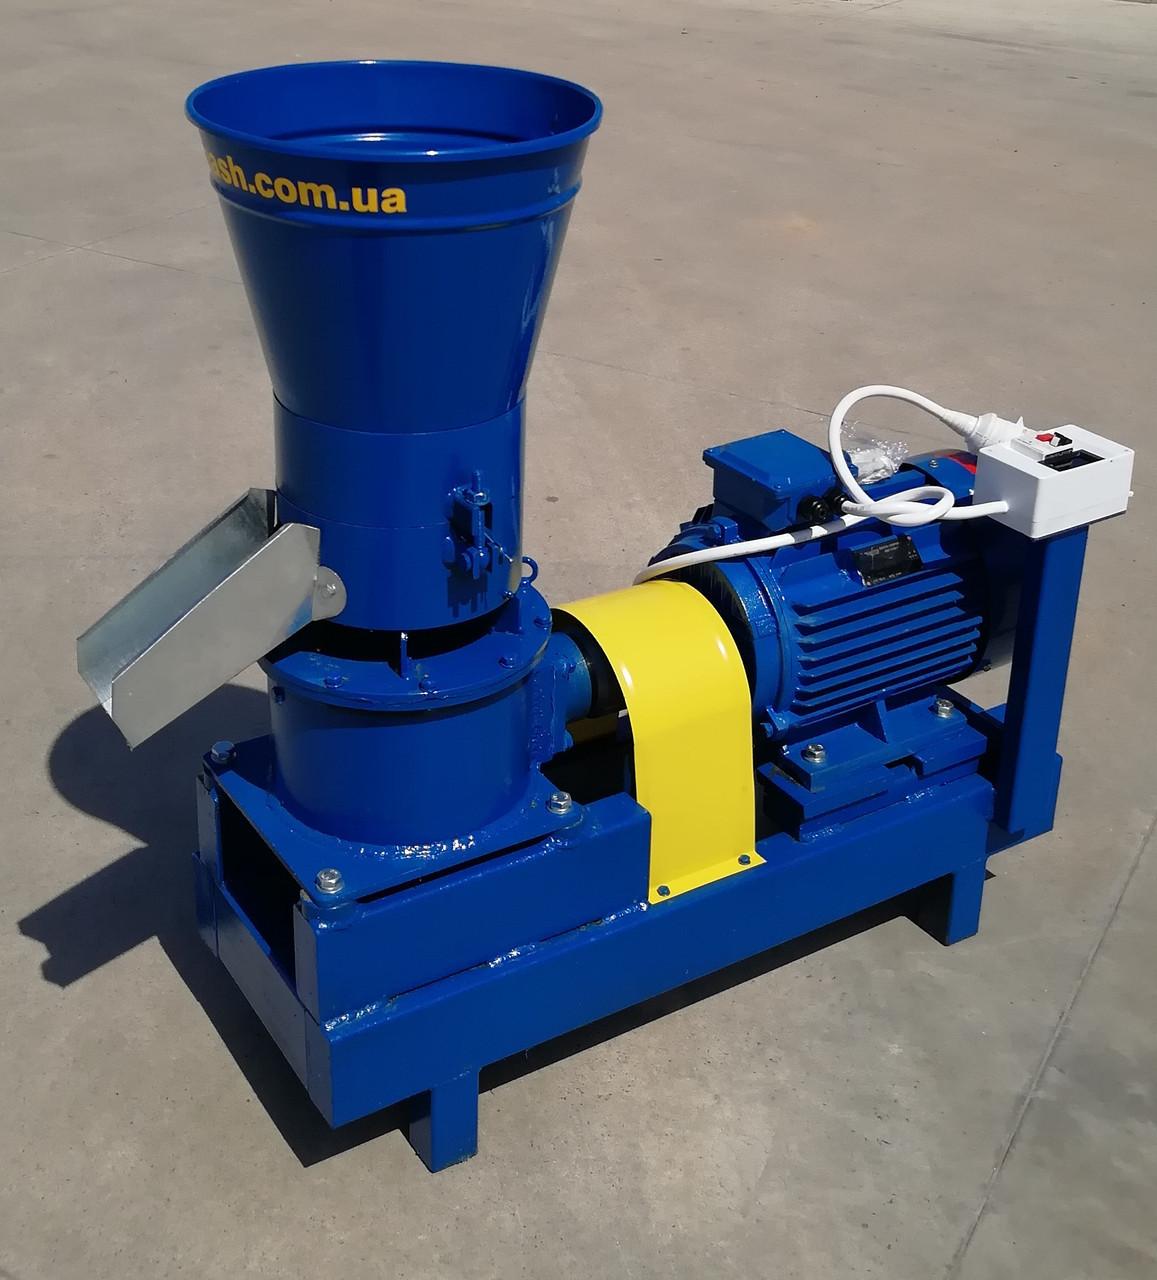 Гранулятор пеллет Артмаш 380 В,11 кВт, 1000 об/мин